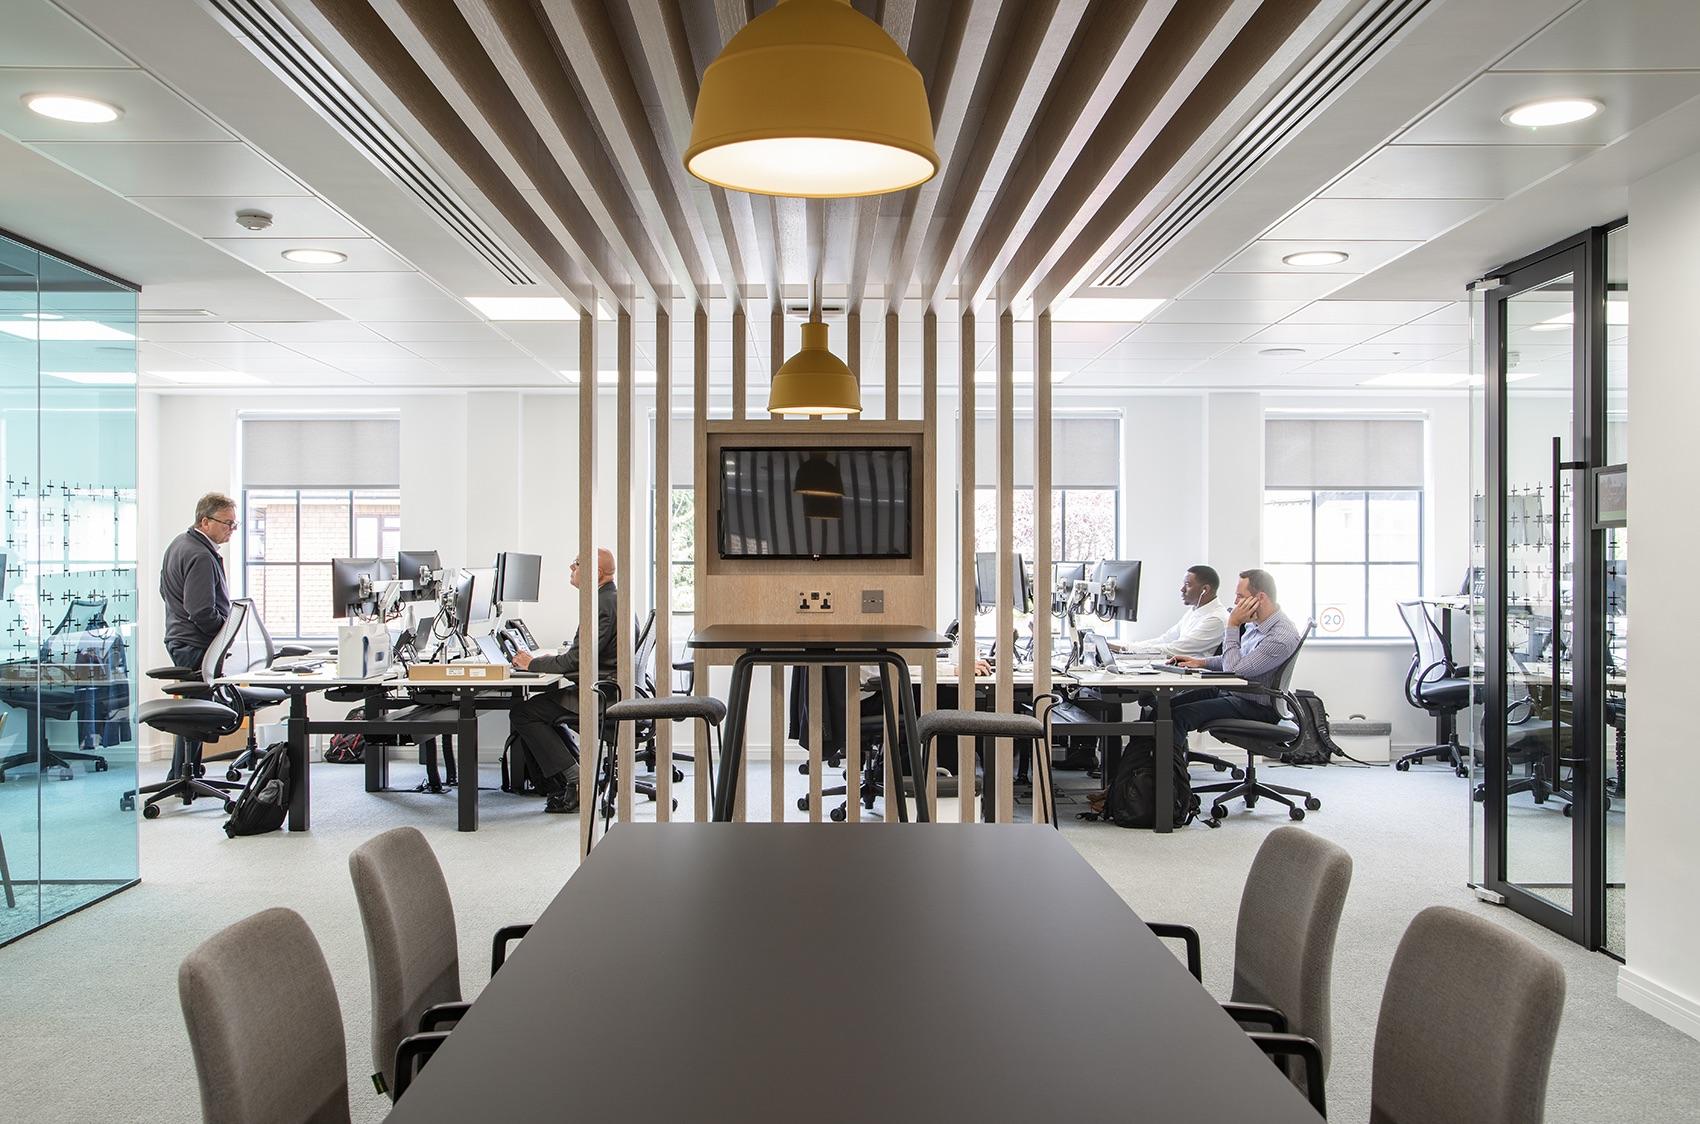 peldon-rose-new-office-london-14